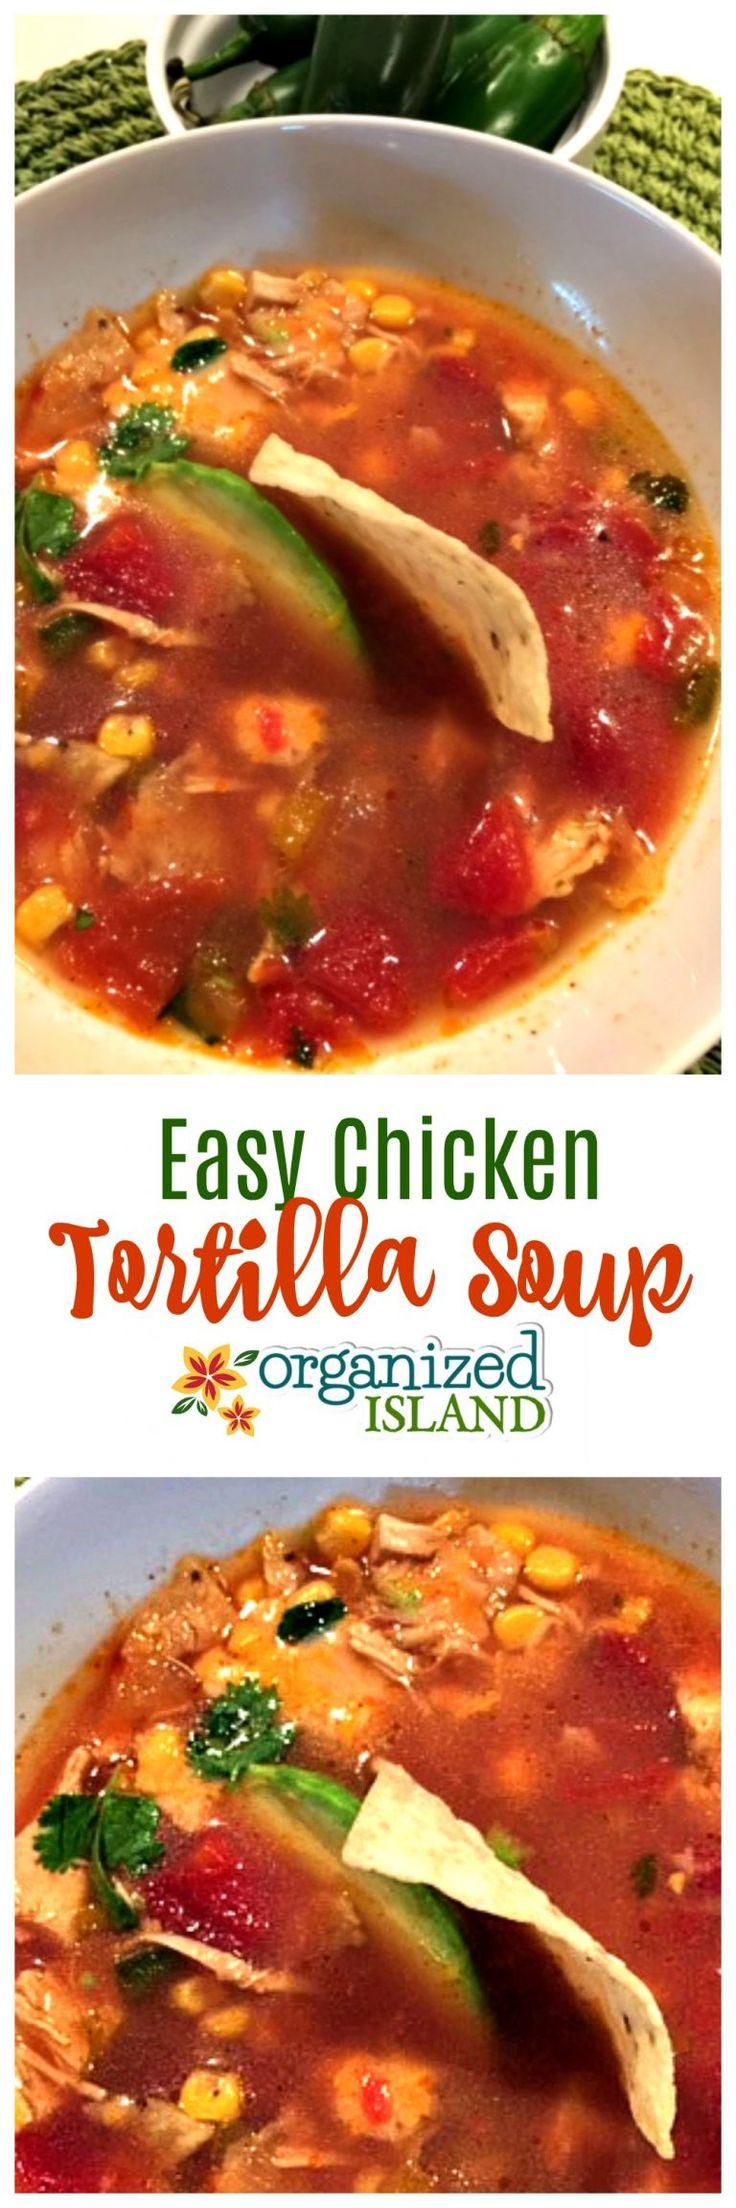 This Chicken Tortilla Soup recipe is so easy and tasty!     #chicken #tortilla #soup #soups #recipe #recipes #dinneridea #souprecipe